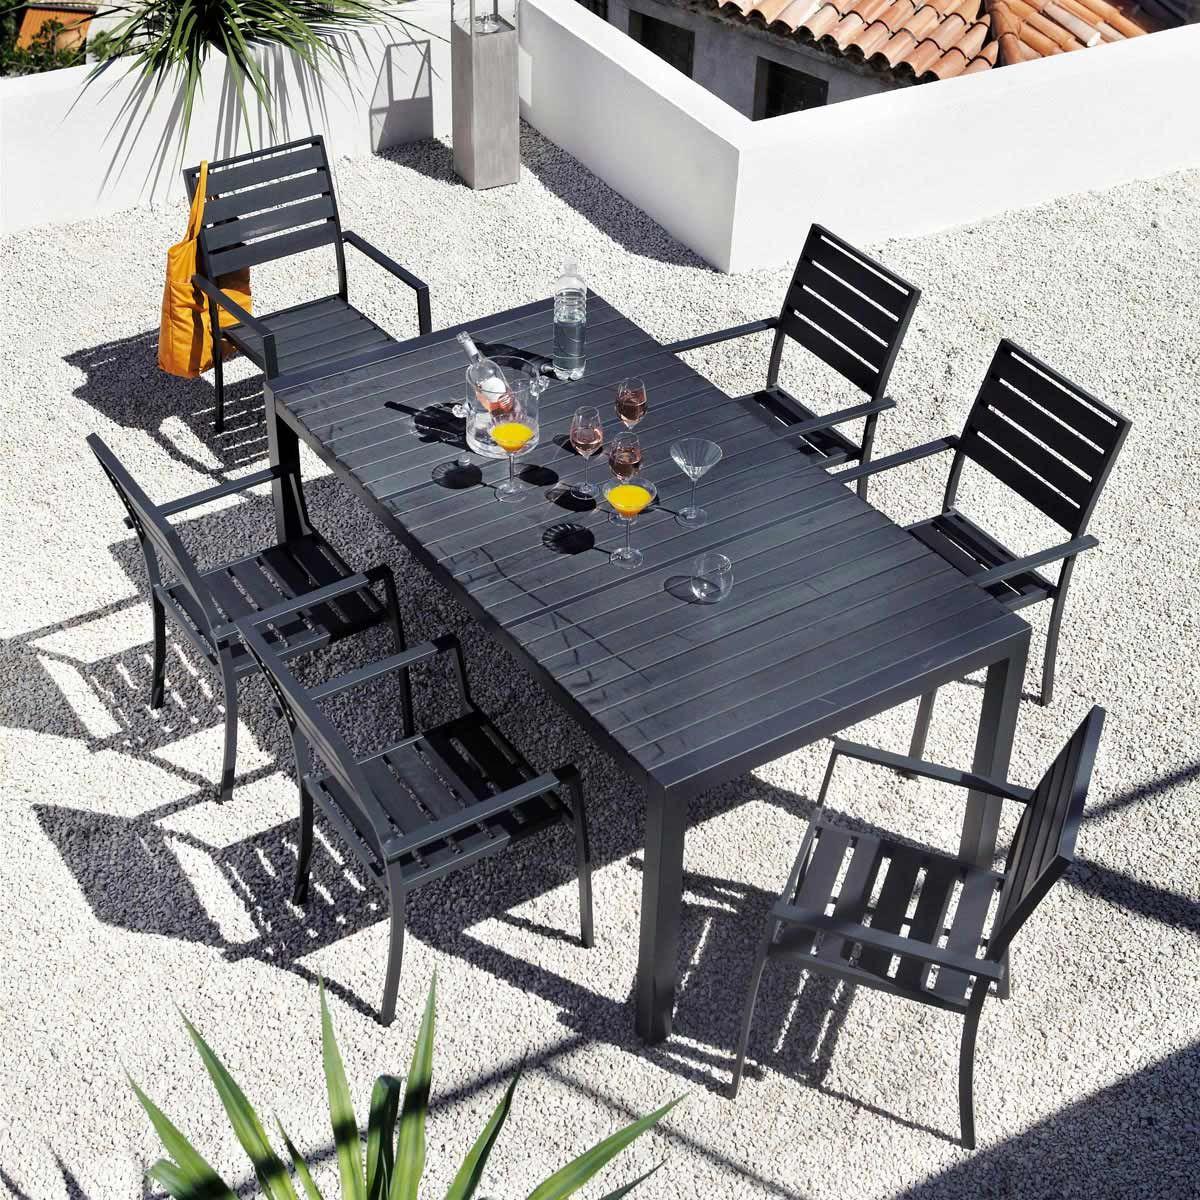 Fauteuil de jardin en aluminium anthracite stromboli for Maison du monde outdoor